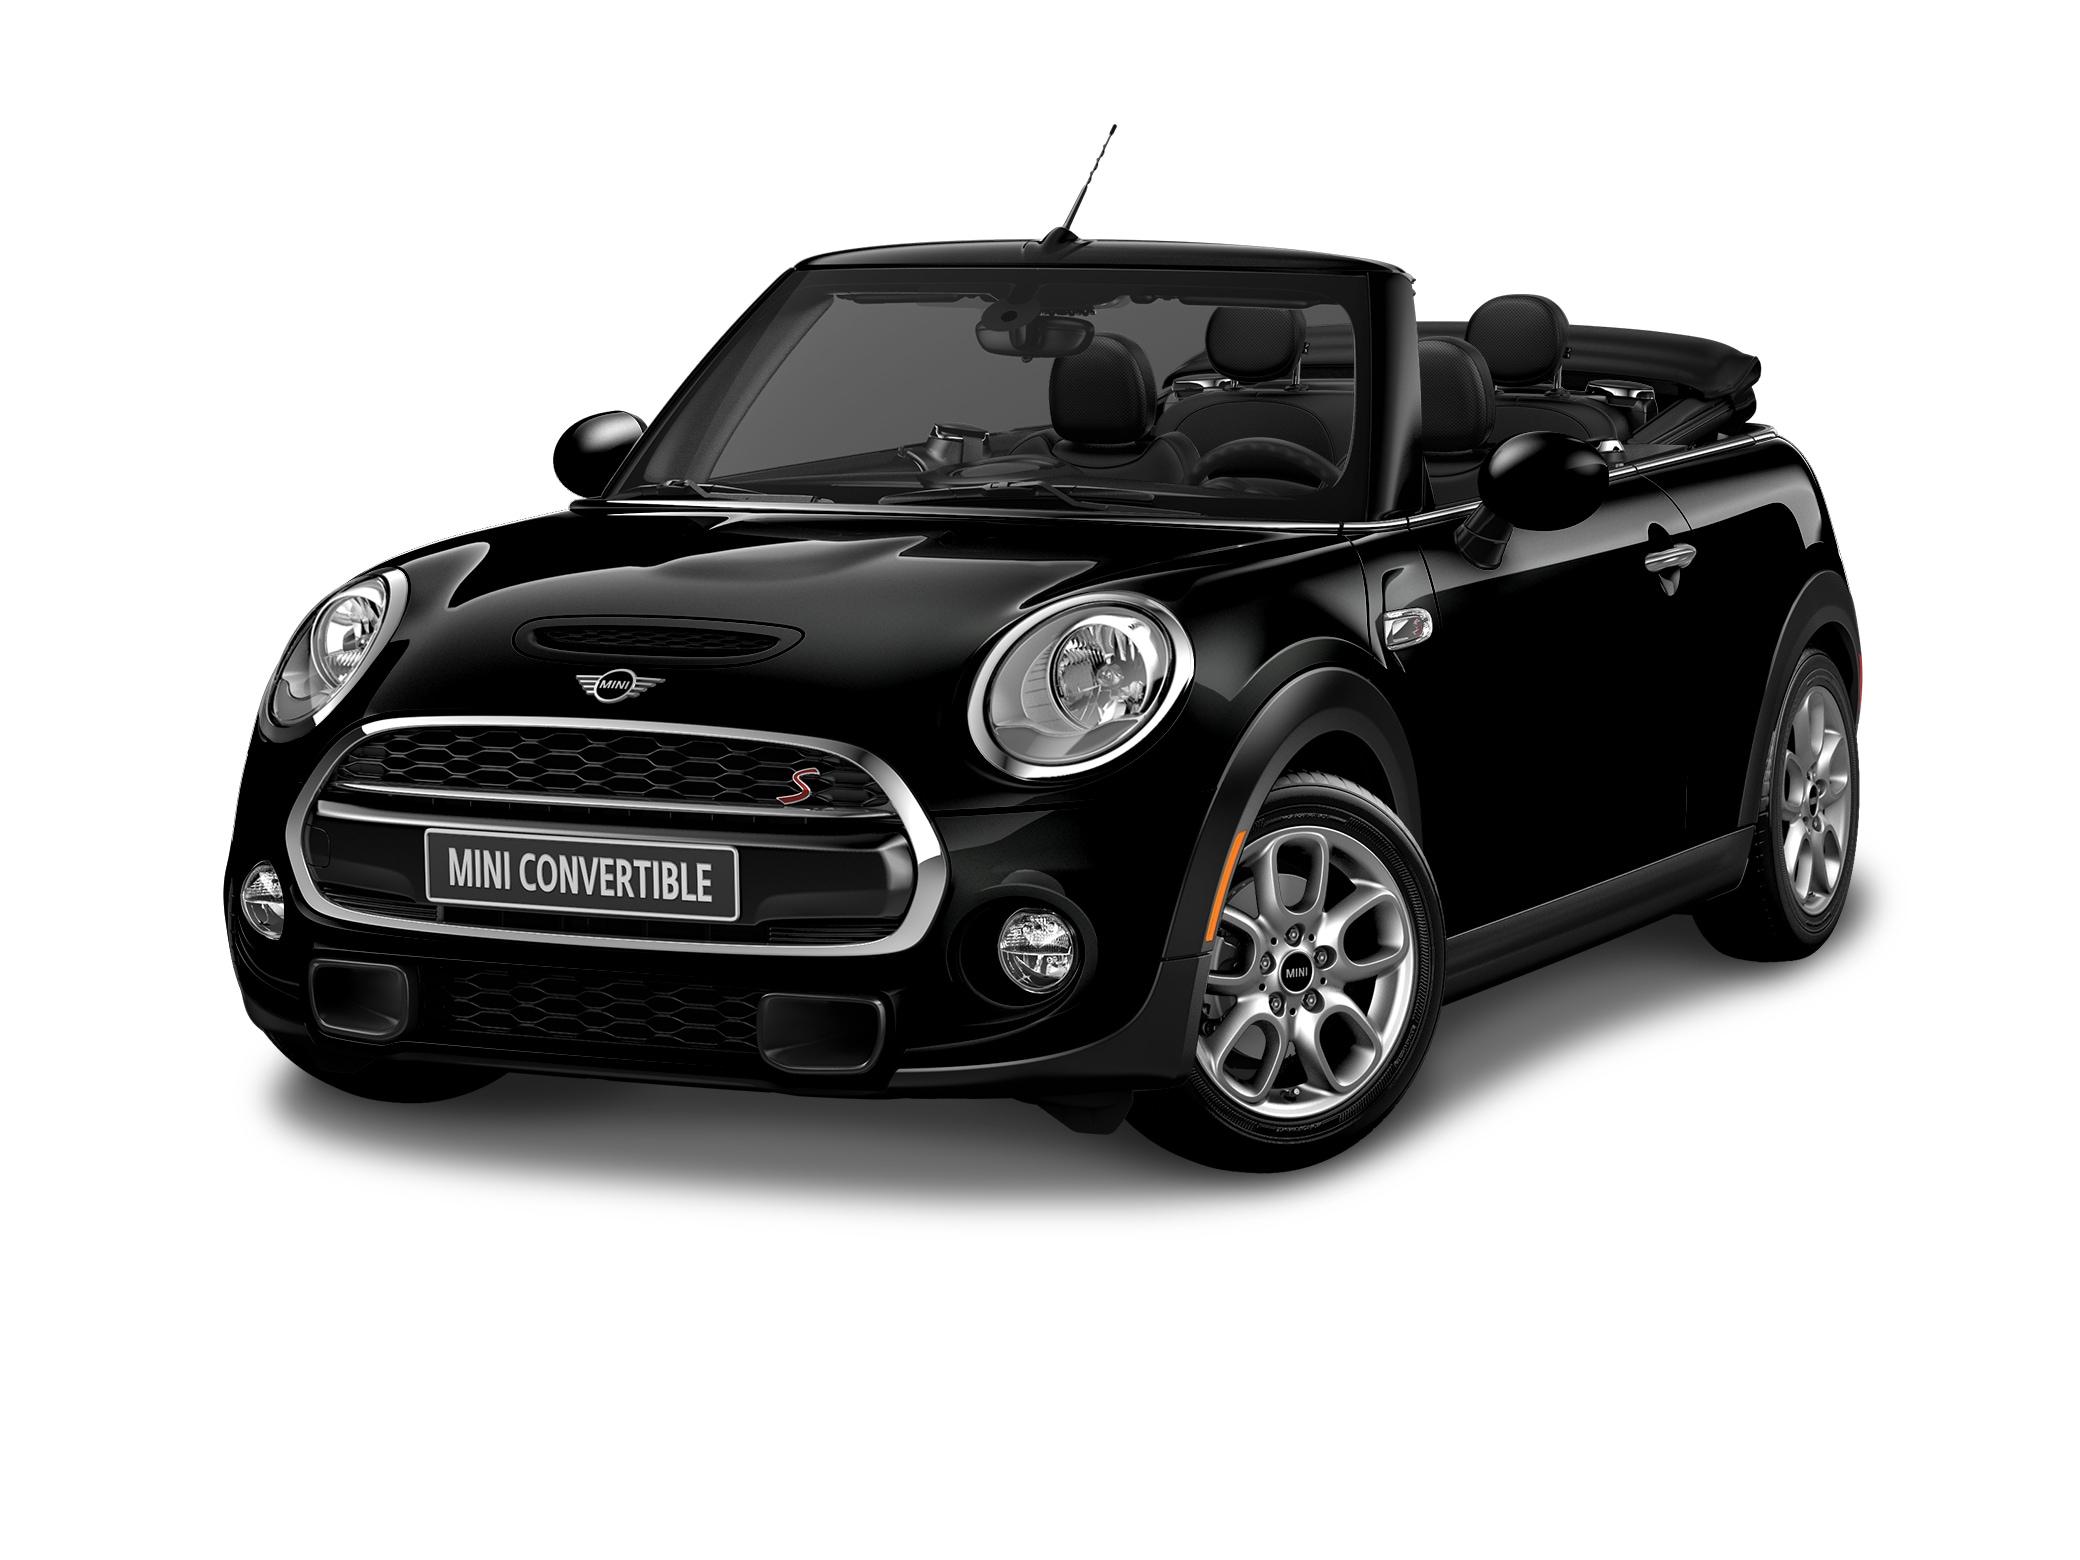 new 2019 mini convertible for sale irvine ca honda engine parts diagram  2019 mini cooper s